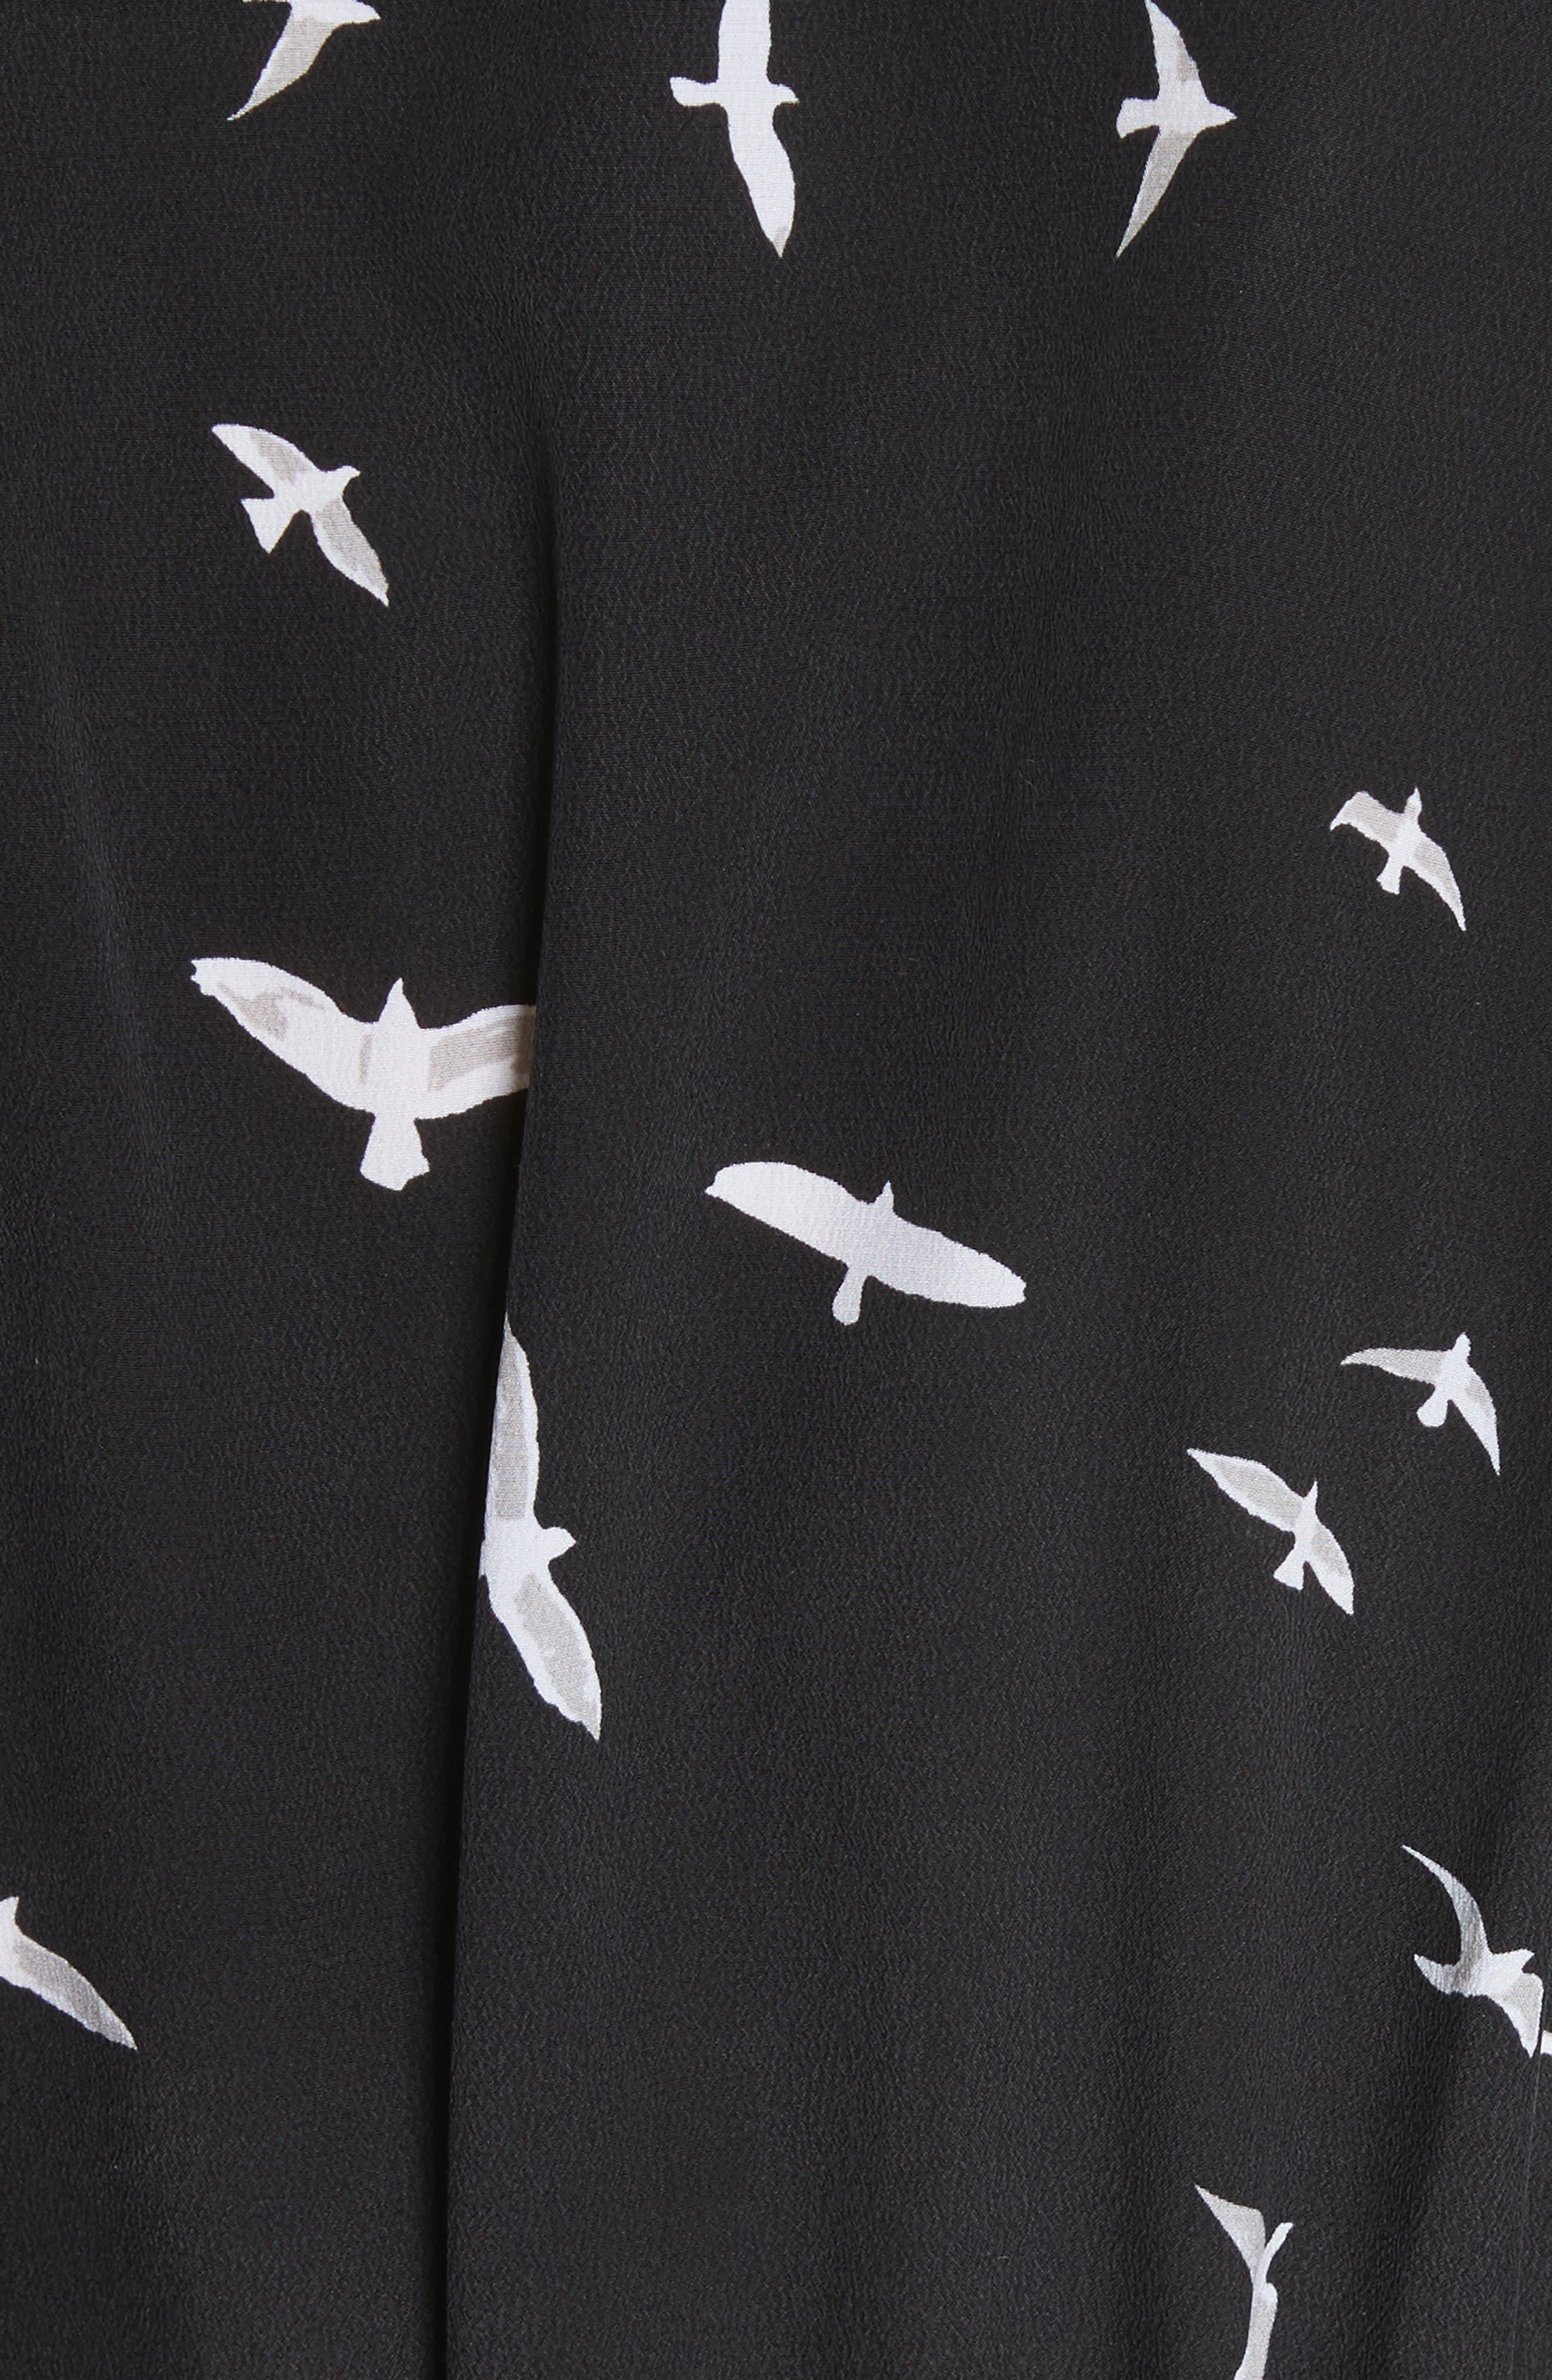 Bird Print Silk Maxi Dress,                             Alternate thumbnail 5, color,                             003